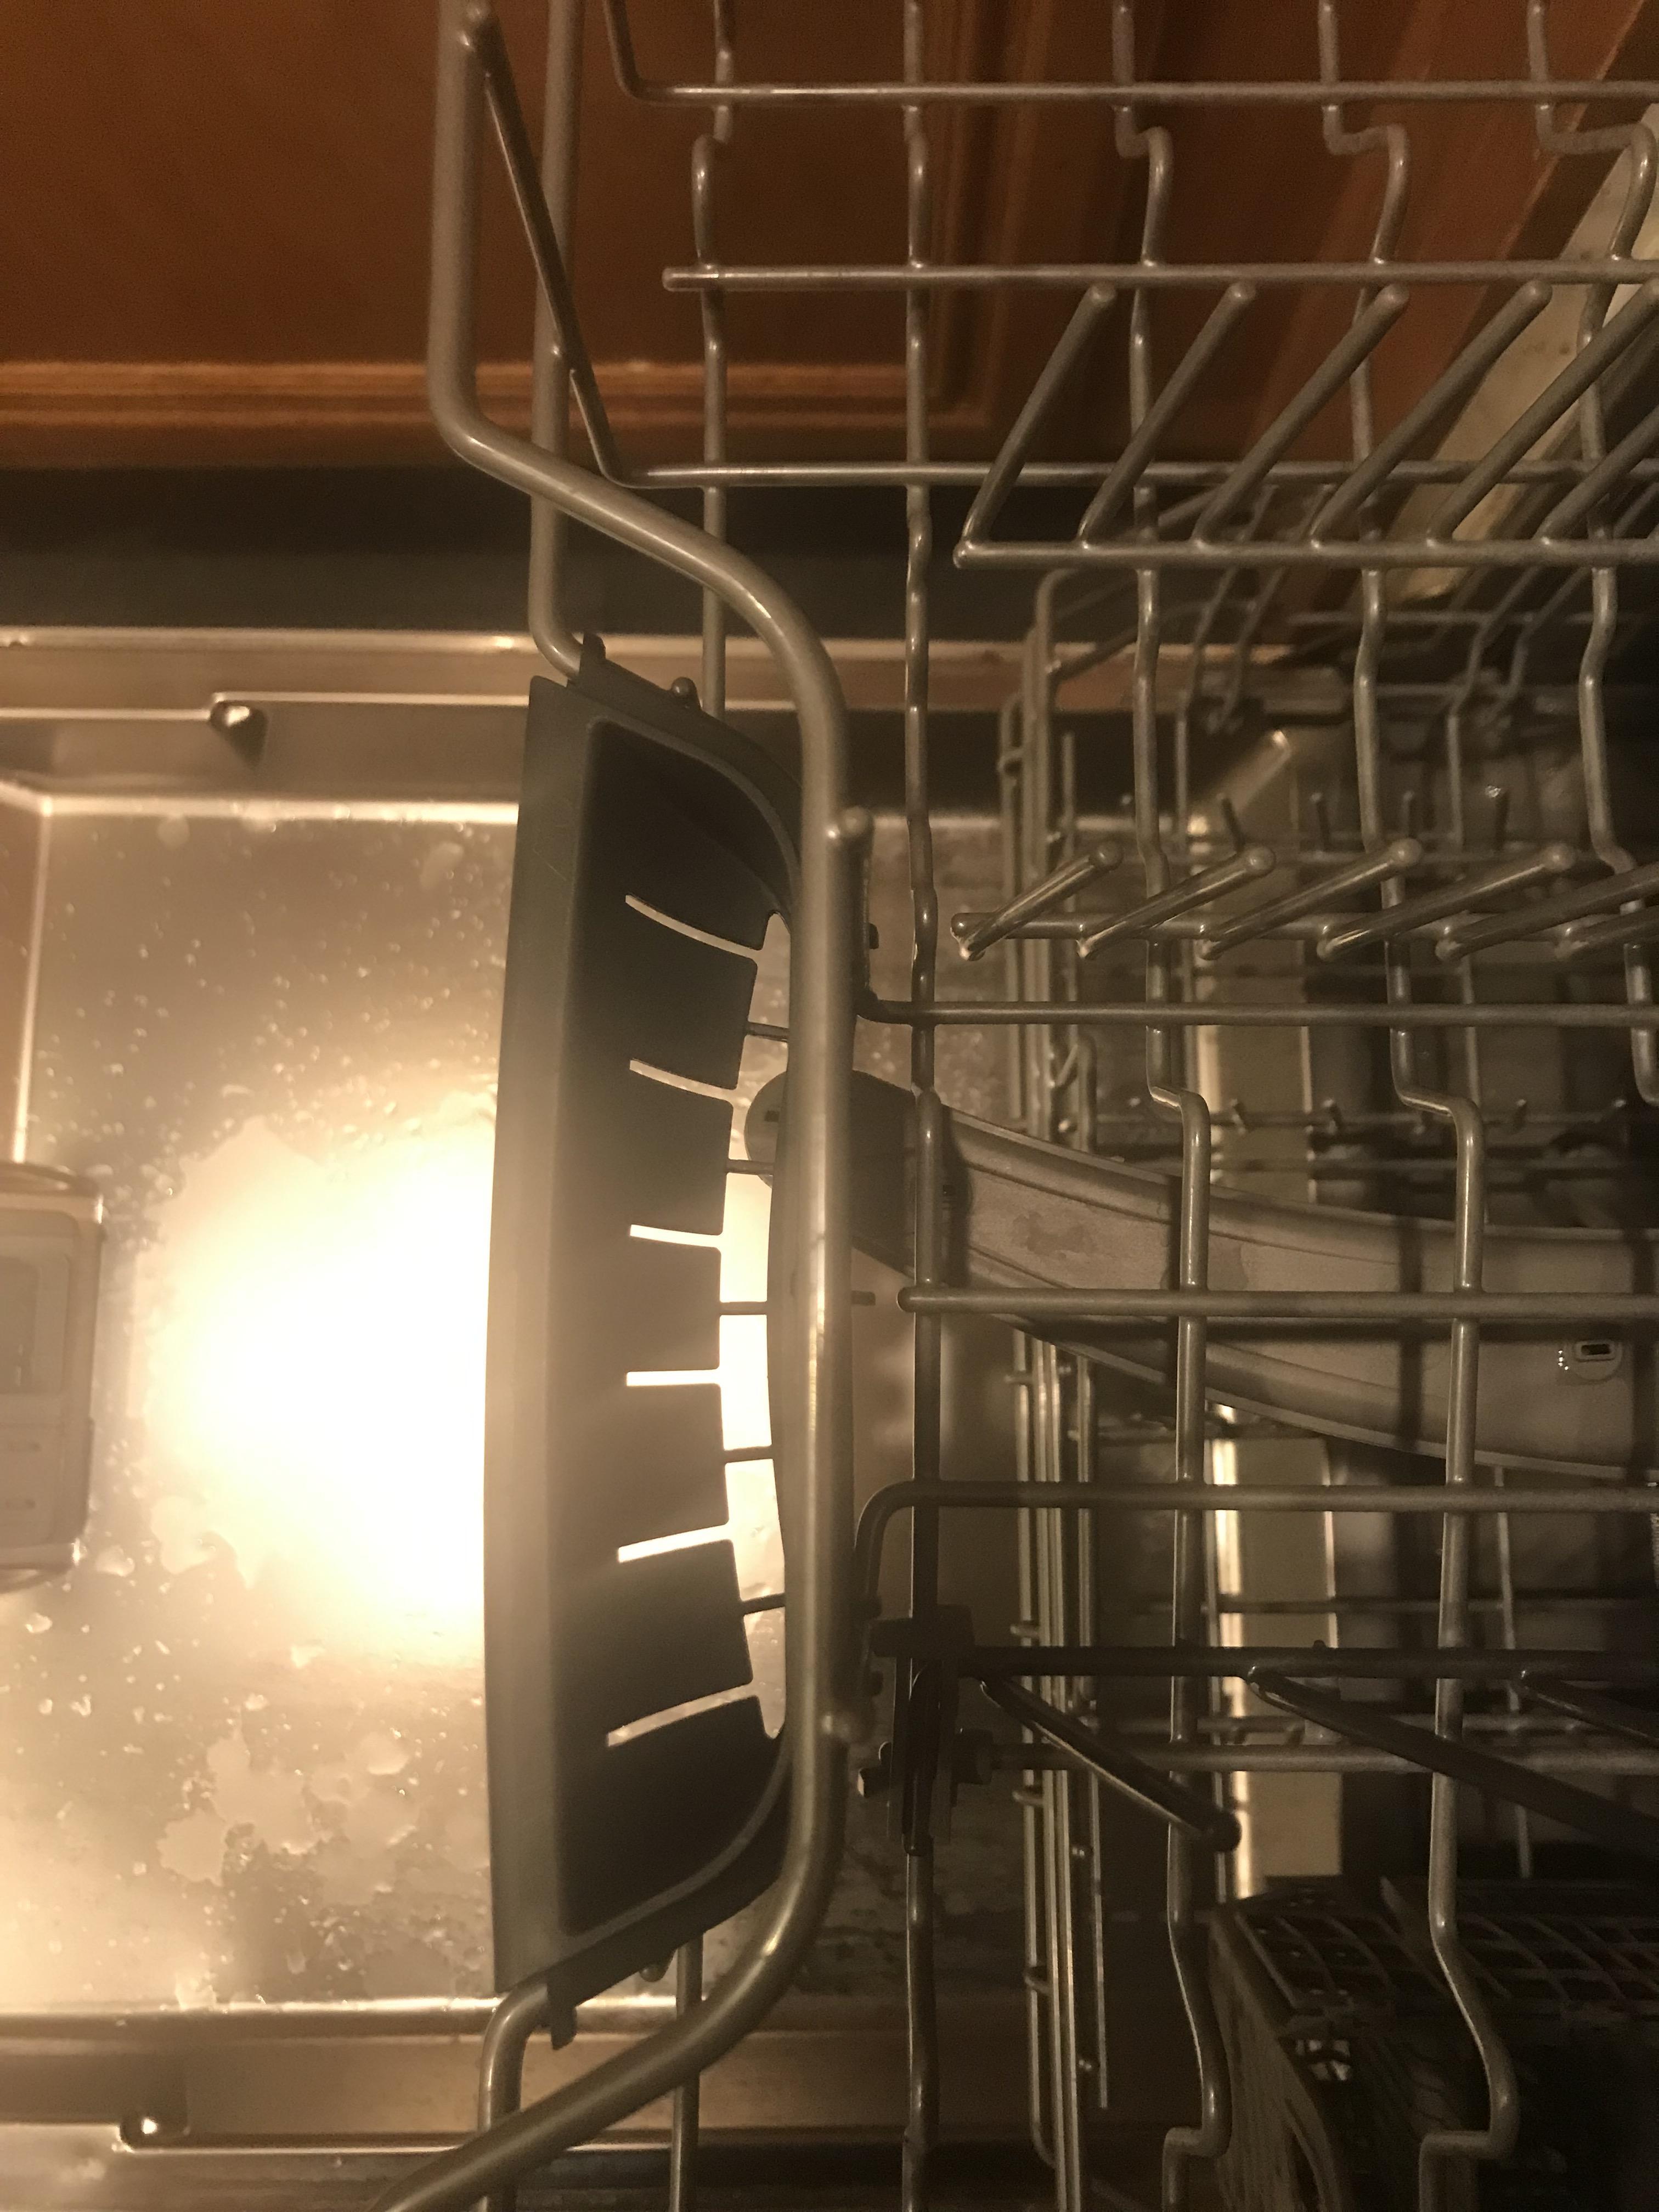 Bosch Dishwasher Top Rack : bosch, dishwasher, Handle, Bosch, Dishwasher, Strange, Slots, Whatisthisthing